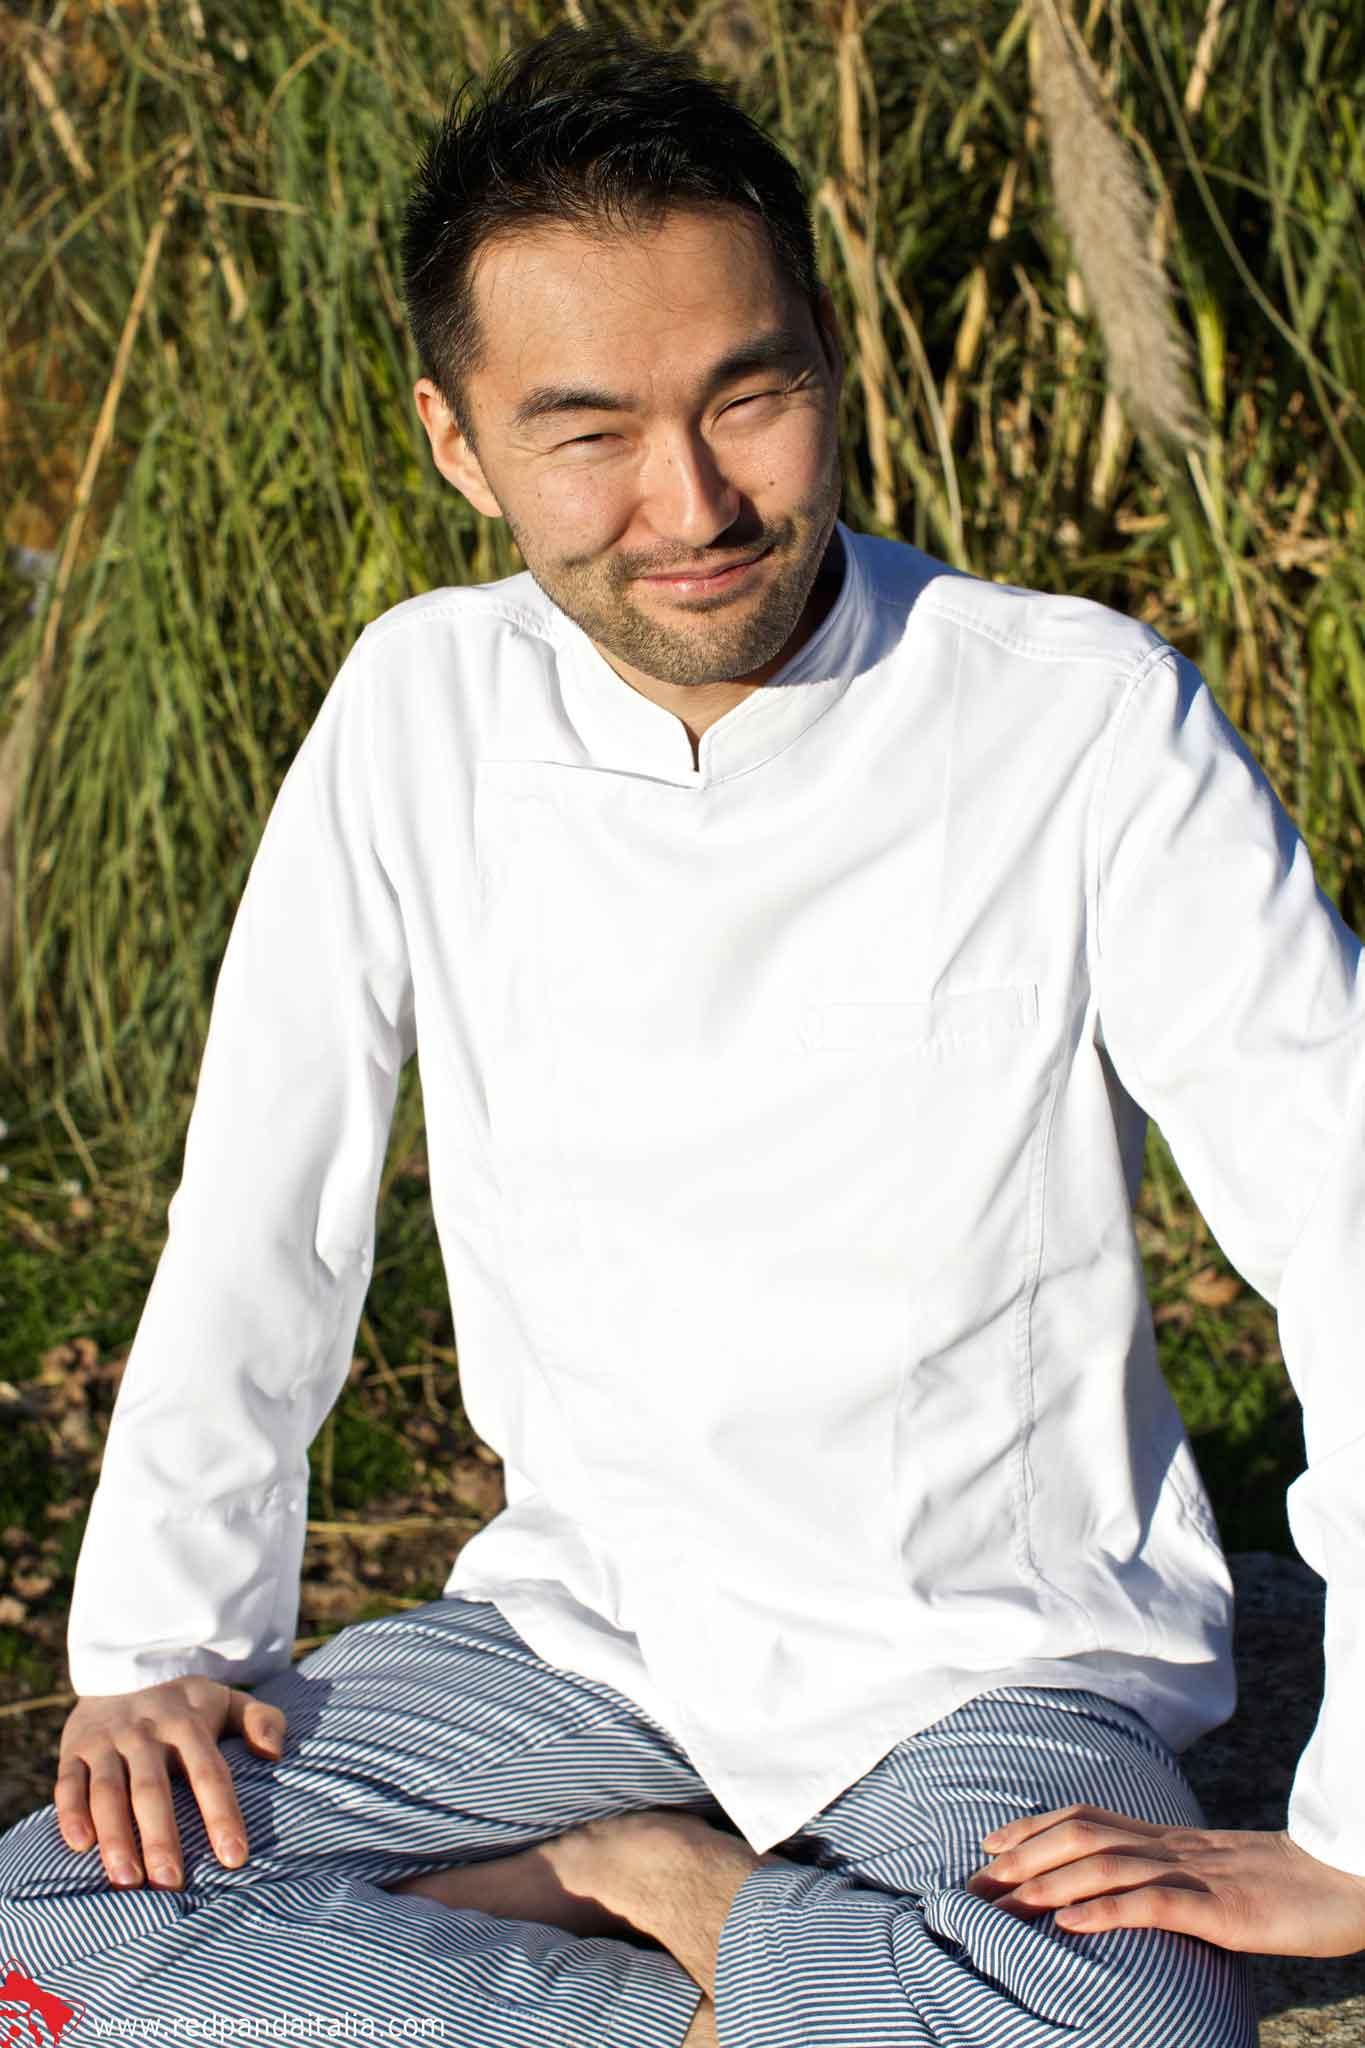 Takeshi Iwai chef